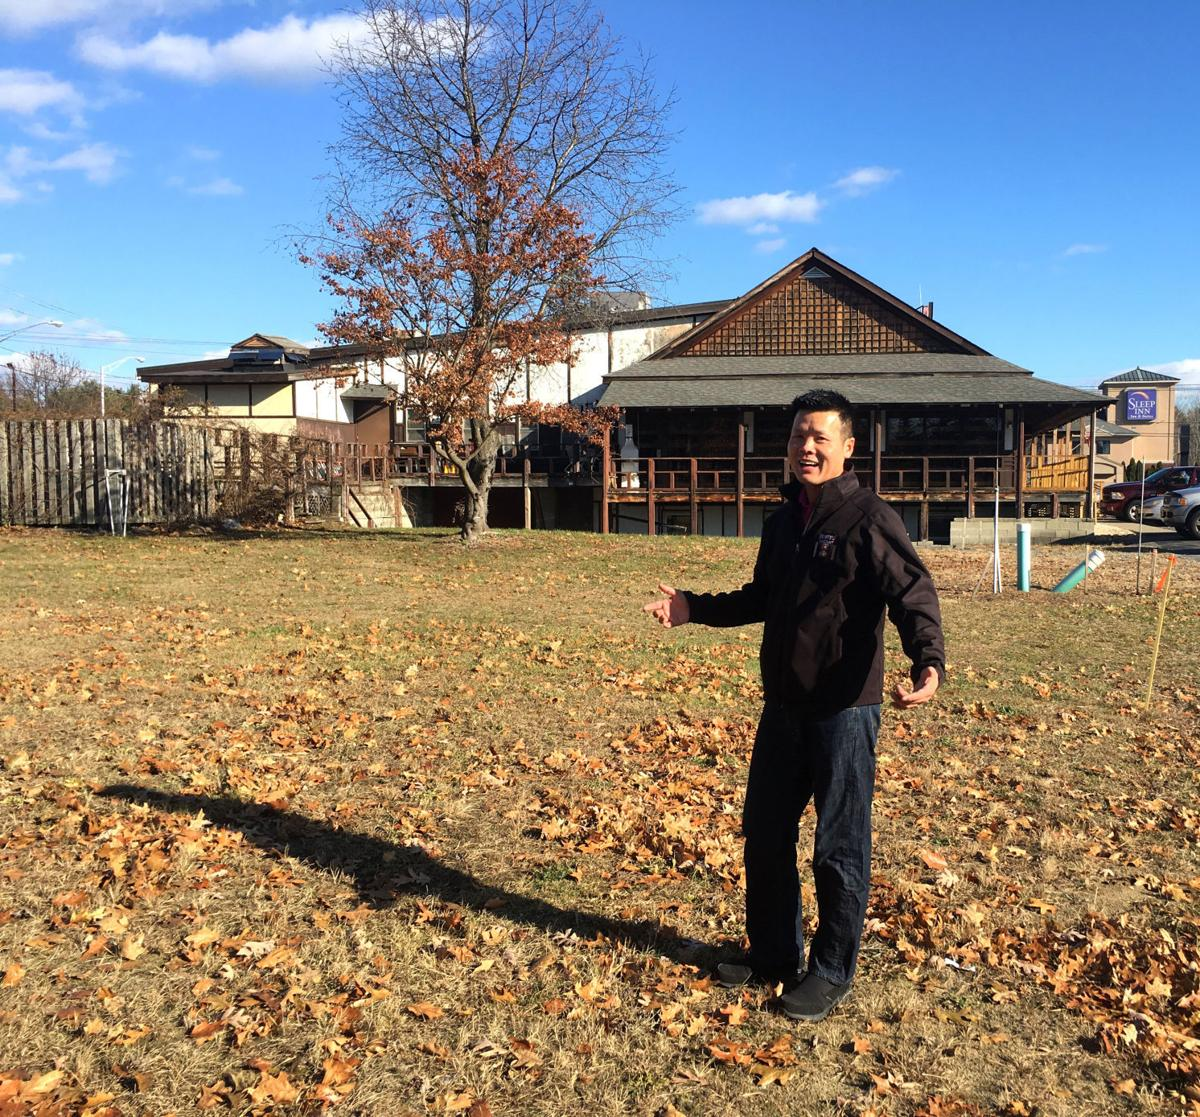 Local businessman, Monty Liu, plans plaza in Walmart's